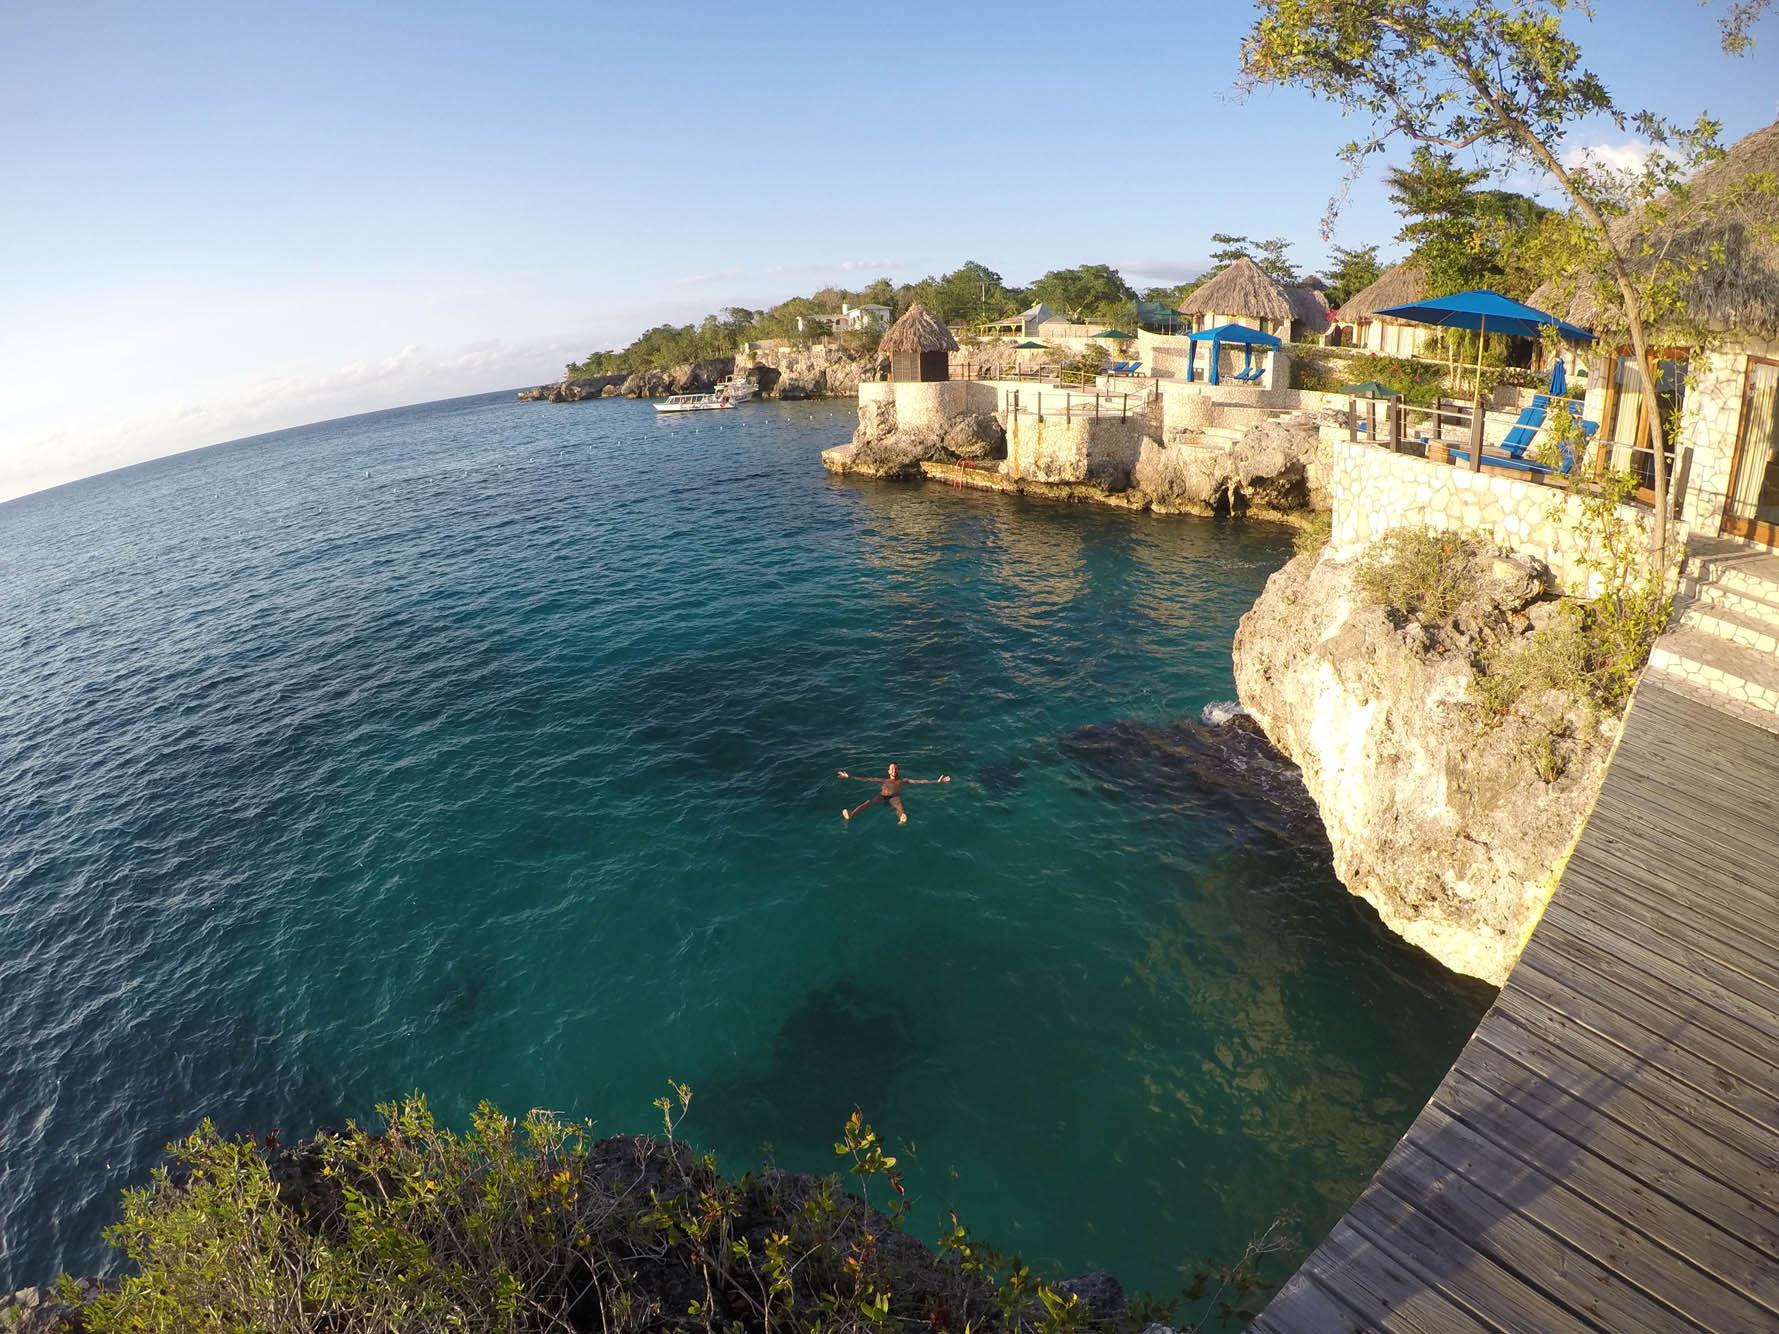 rockhouse hotel negril cliffs jamaica